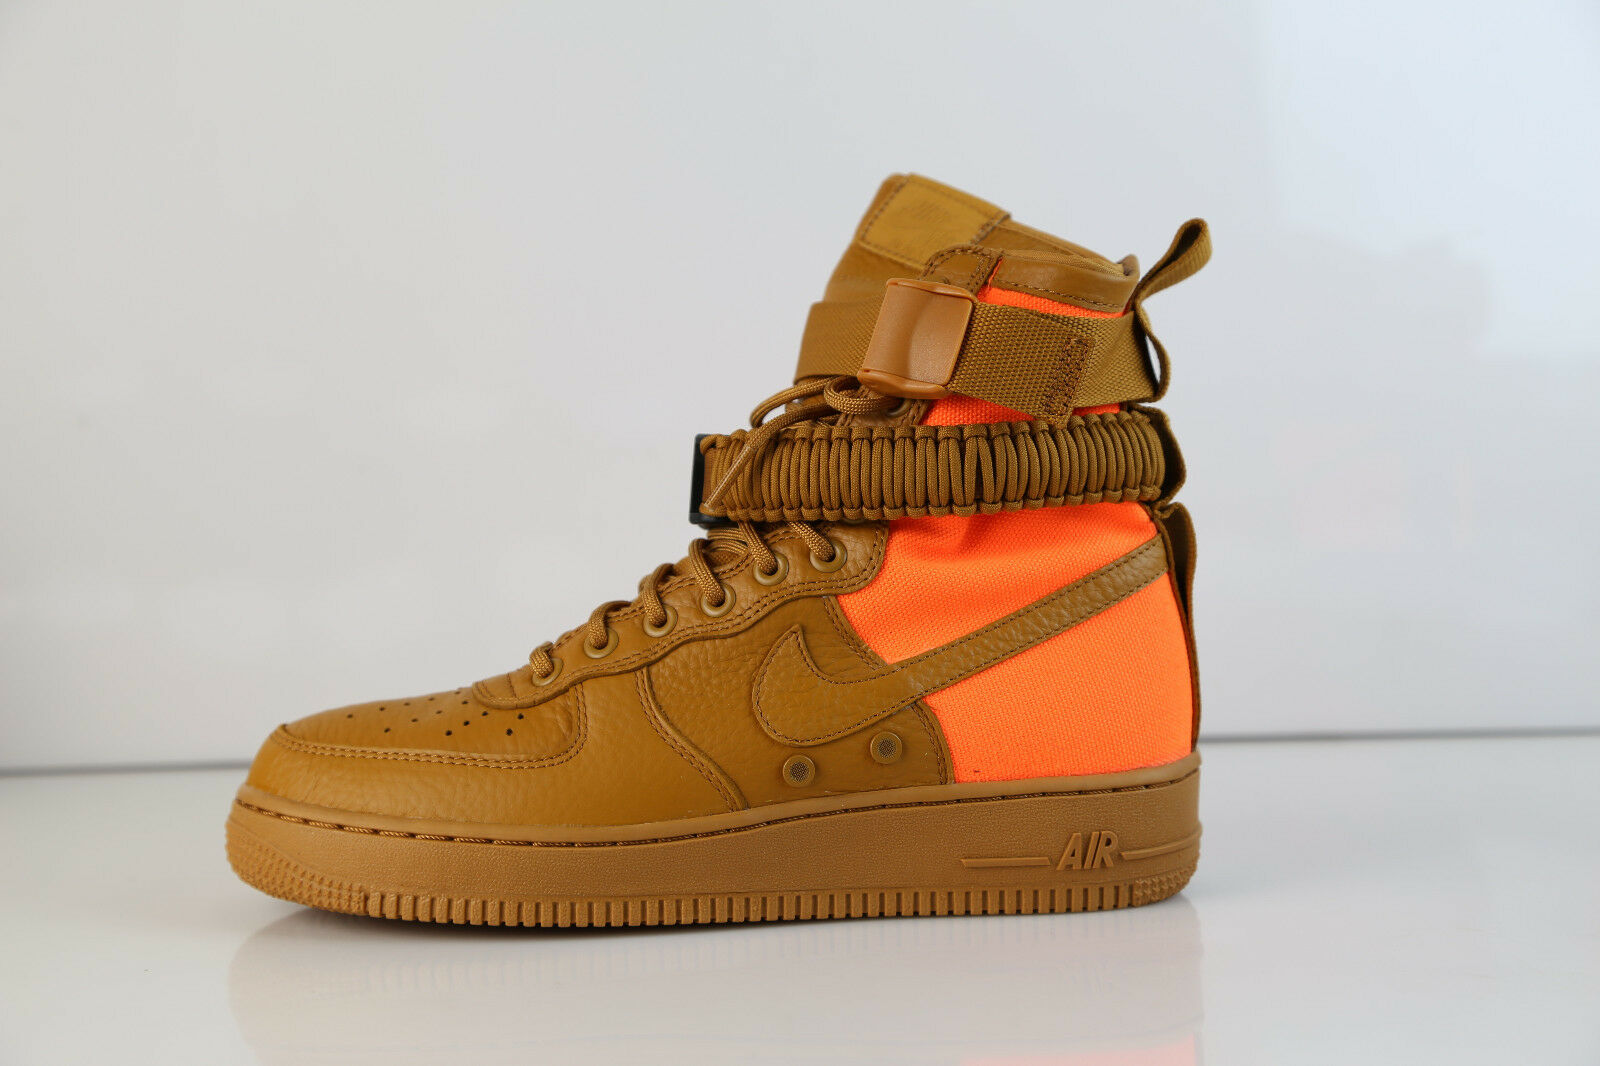 Nike SF AF1 QS Desert Ochre 903270-778 8-11.5 special air force force air 1 28d96a